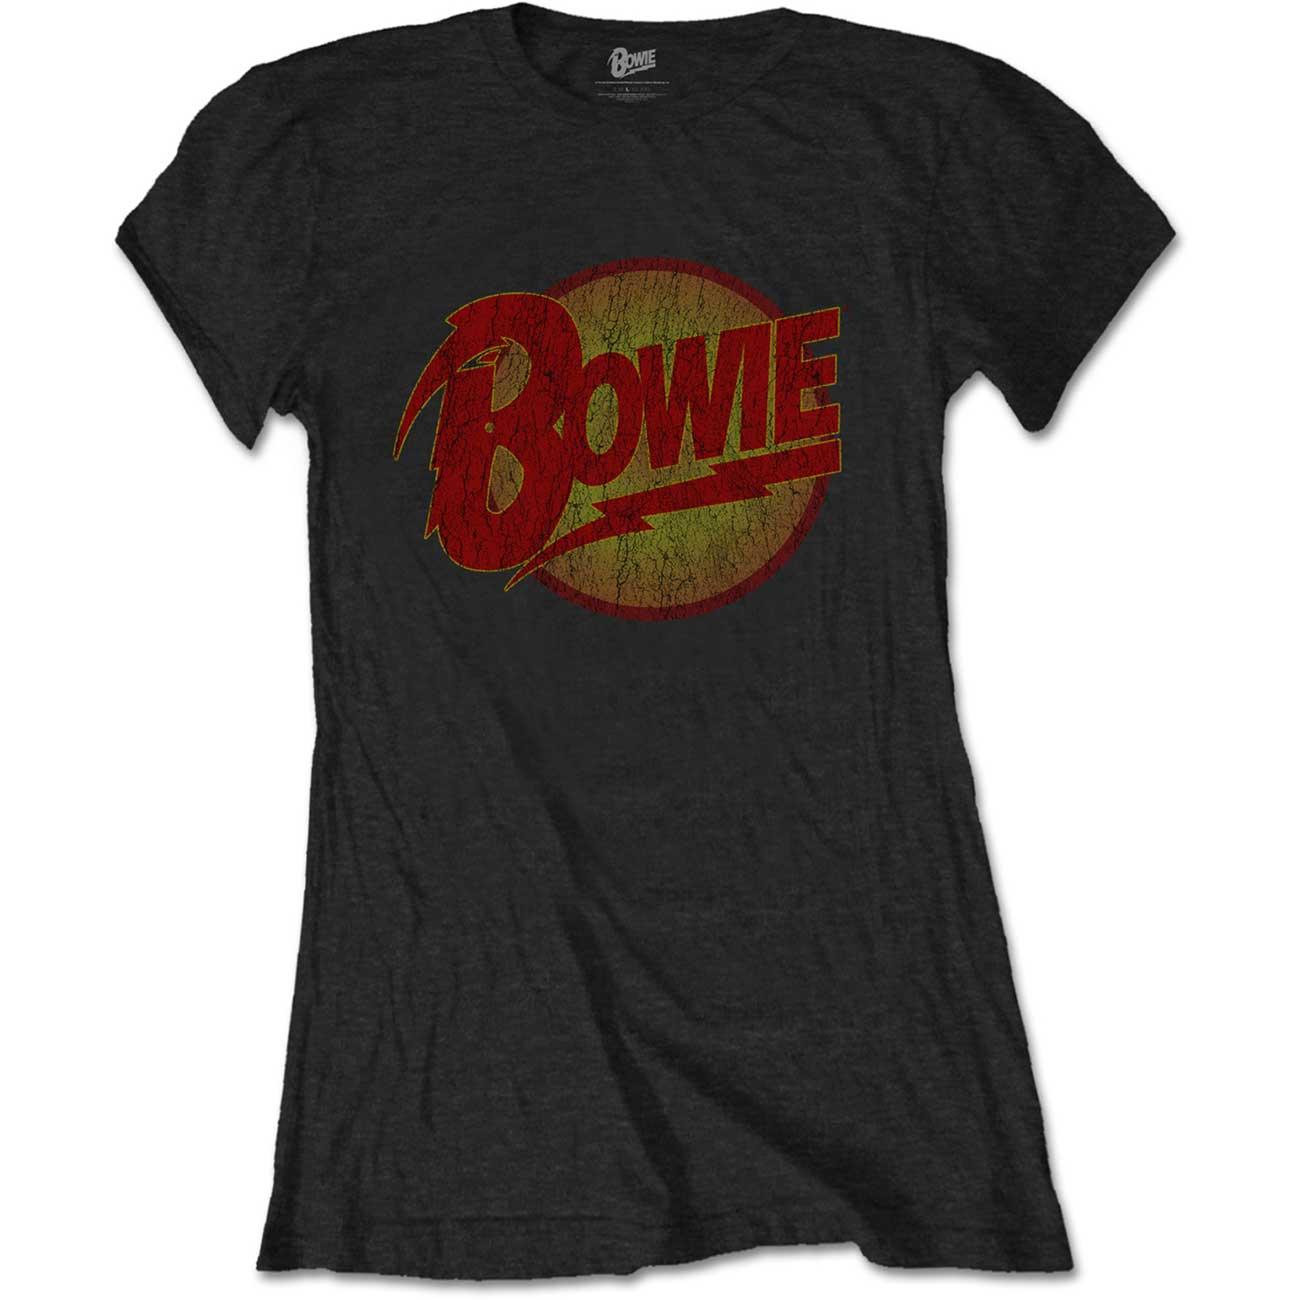 DAVID BOWIE Diamond Dogs Vintage